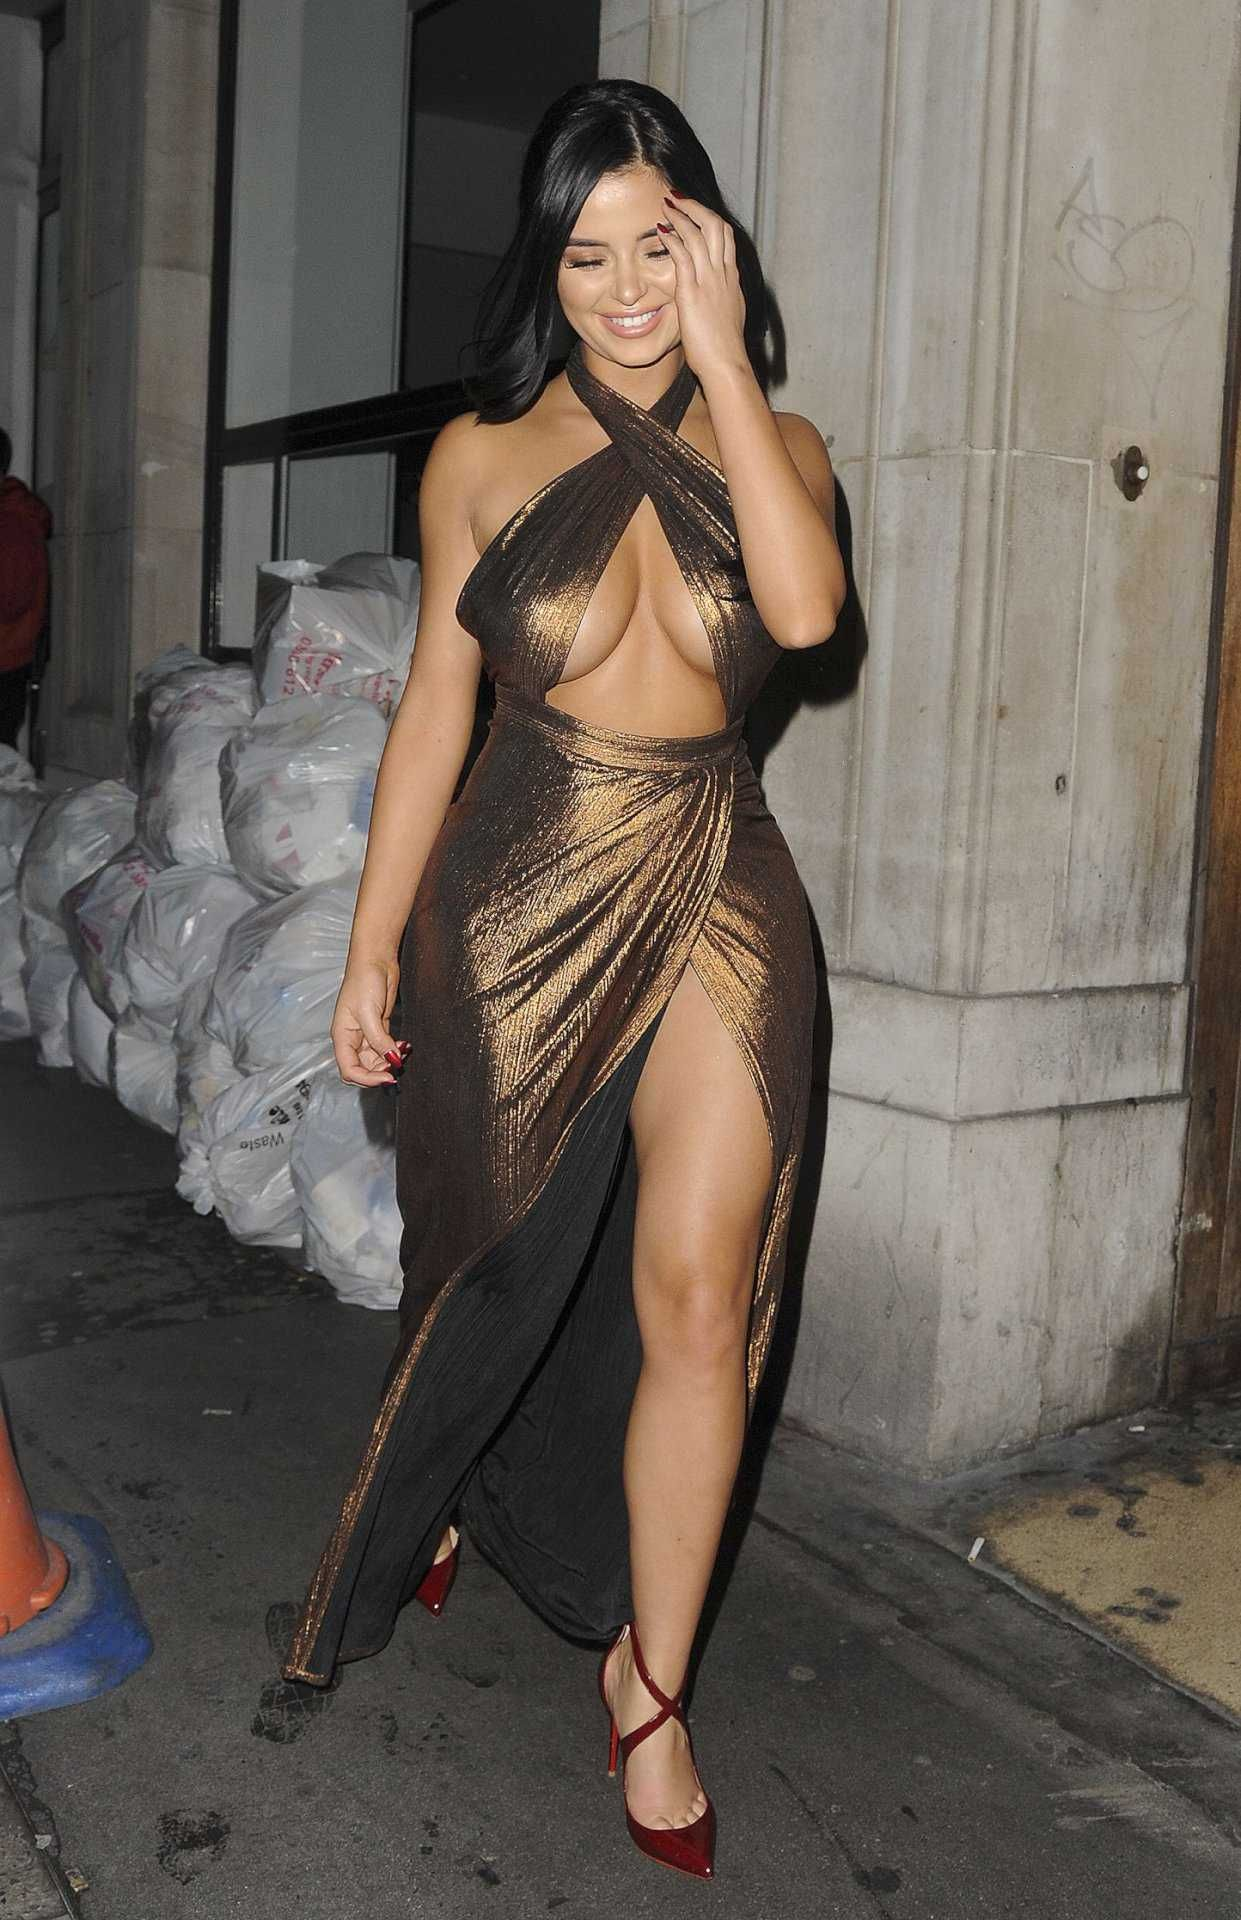 braless #demirose #london demi rose mawby braless out in london